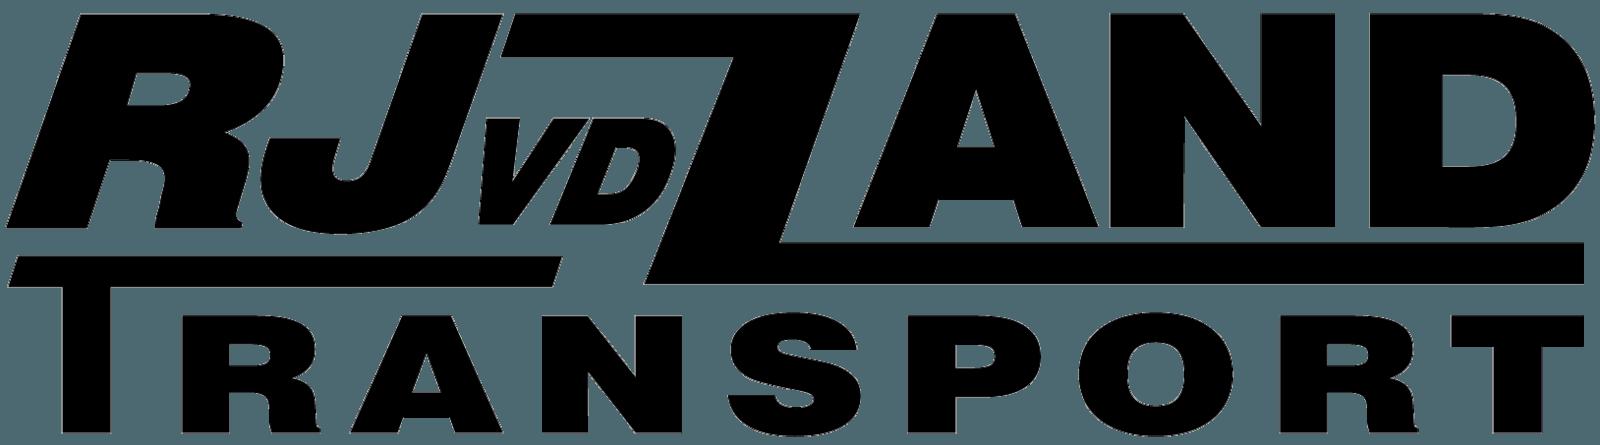 RJ van der Zand Transport